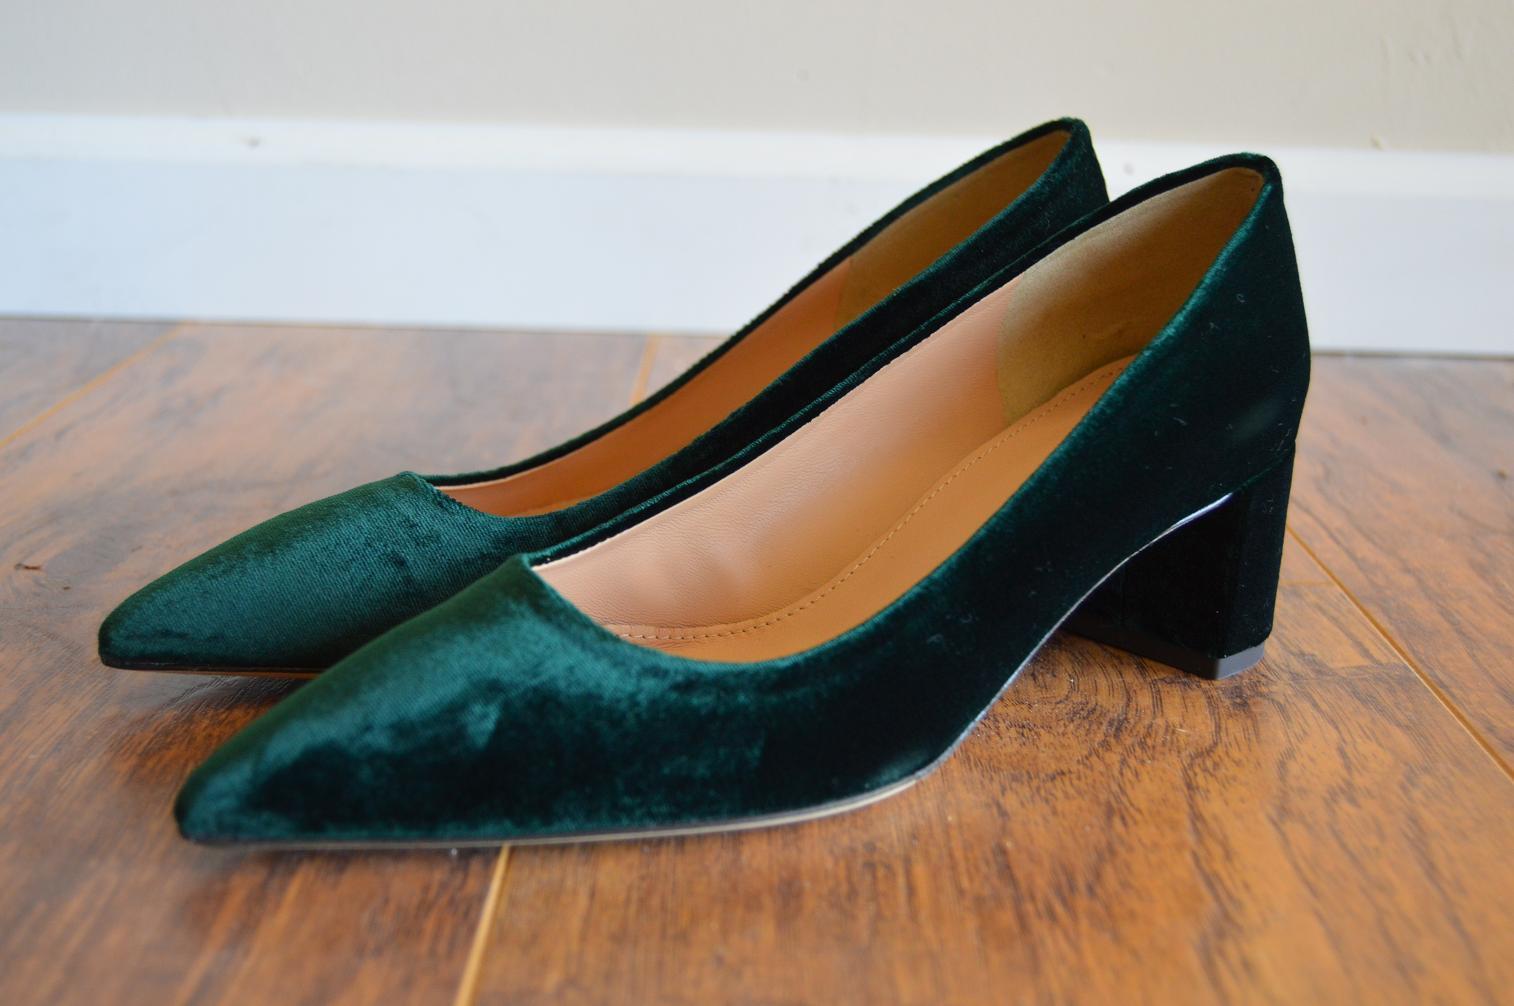 Details about J CREW AVERY Velvet Pumps Dark Forest Green Block Heels F5215 6.5 7 7.5 9 9.5